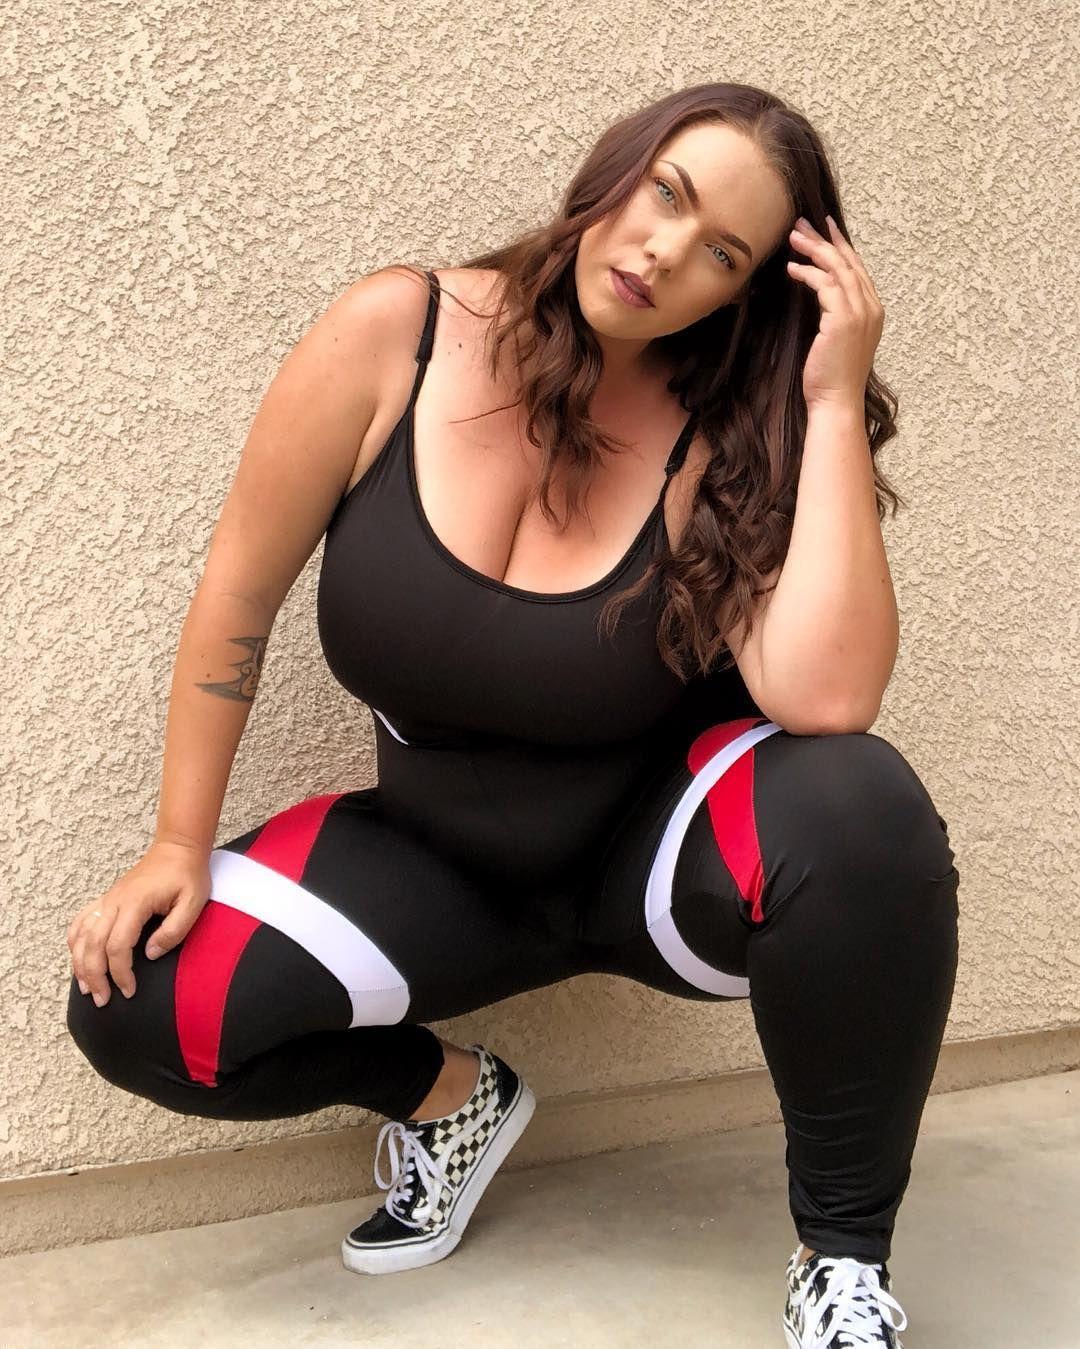 Monica miller photo